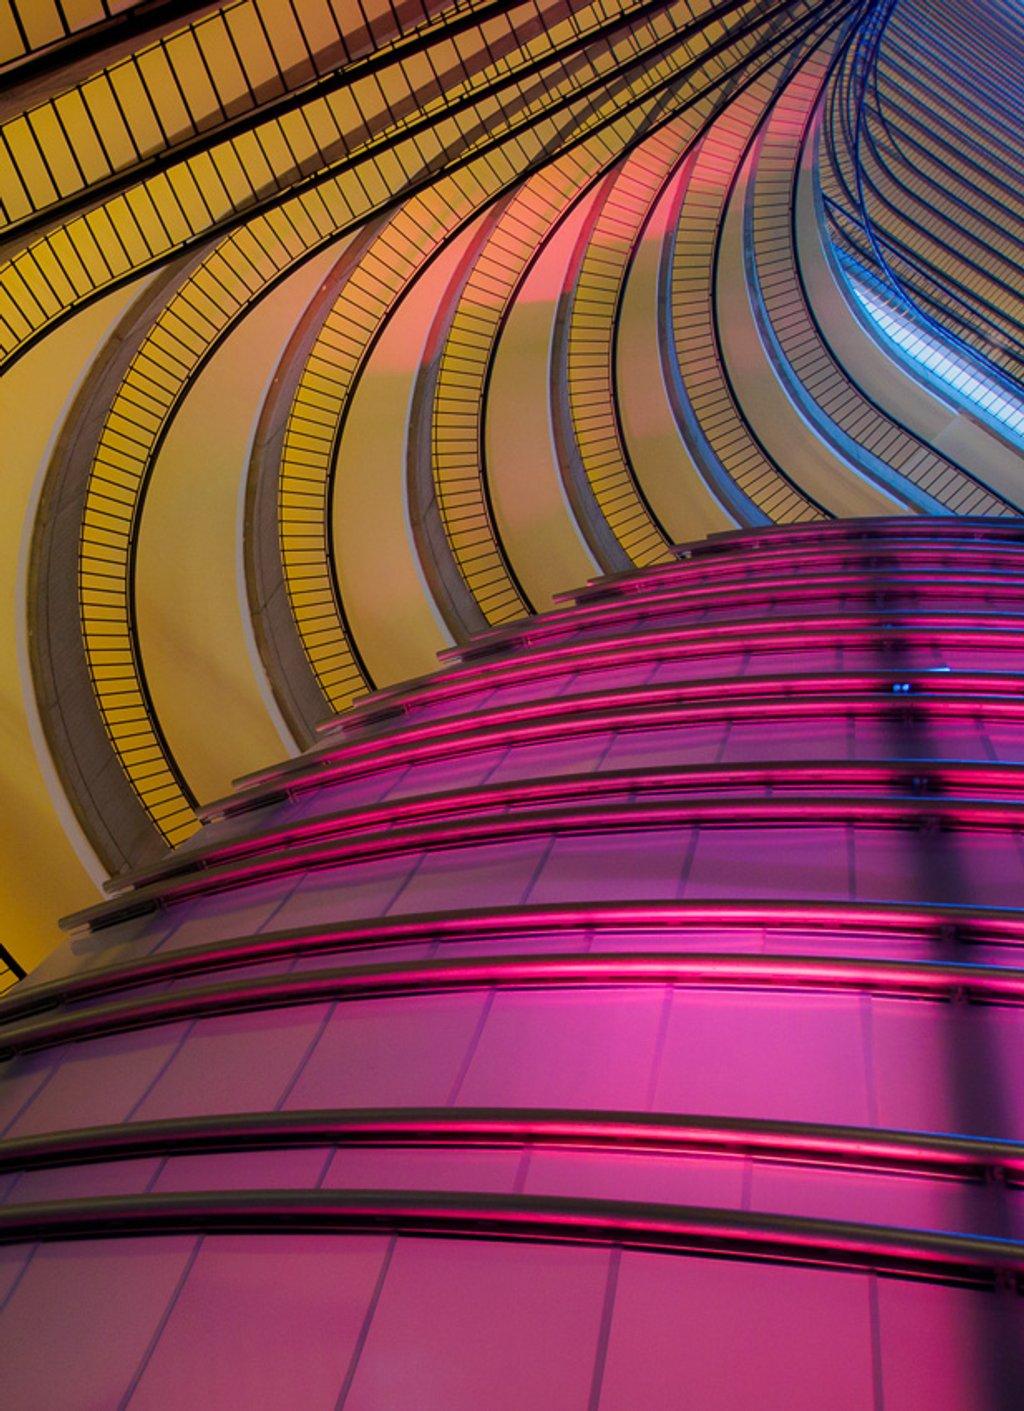 Yet Another Atrium Image by fotoblah